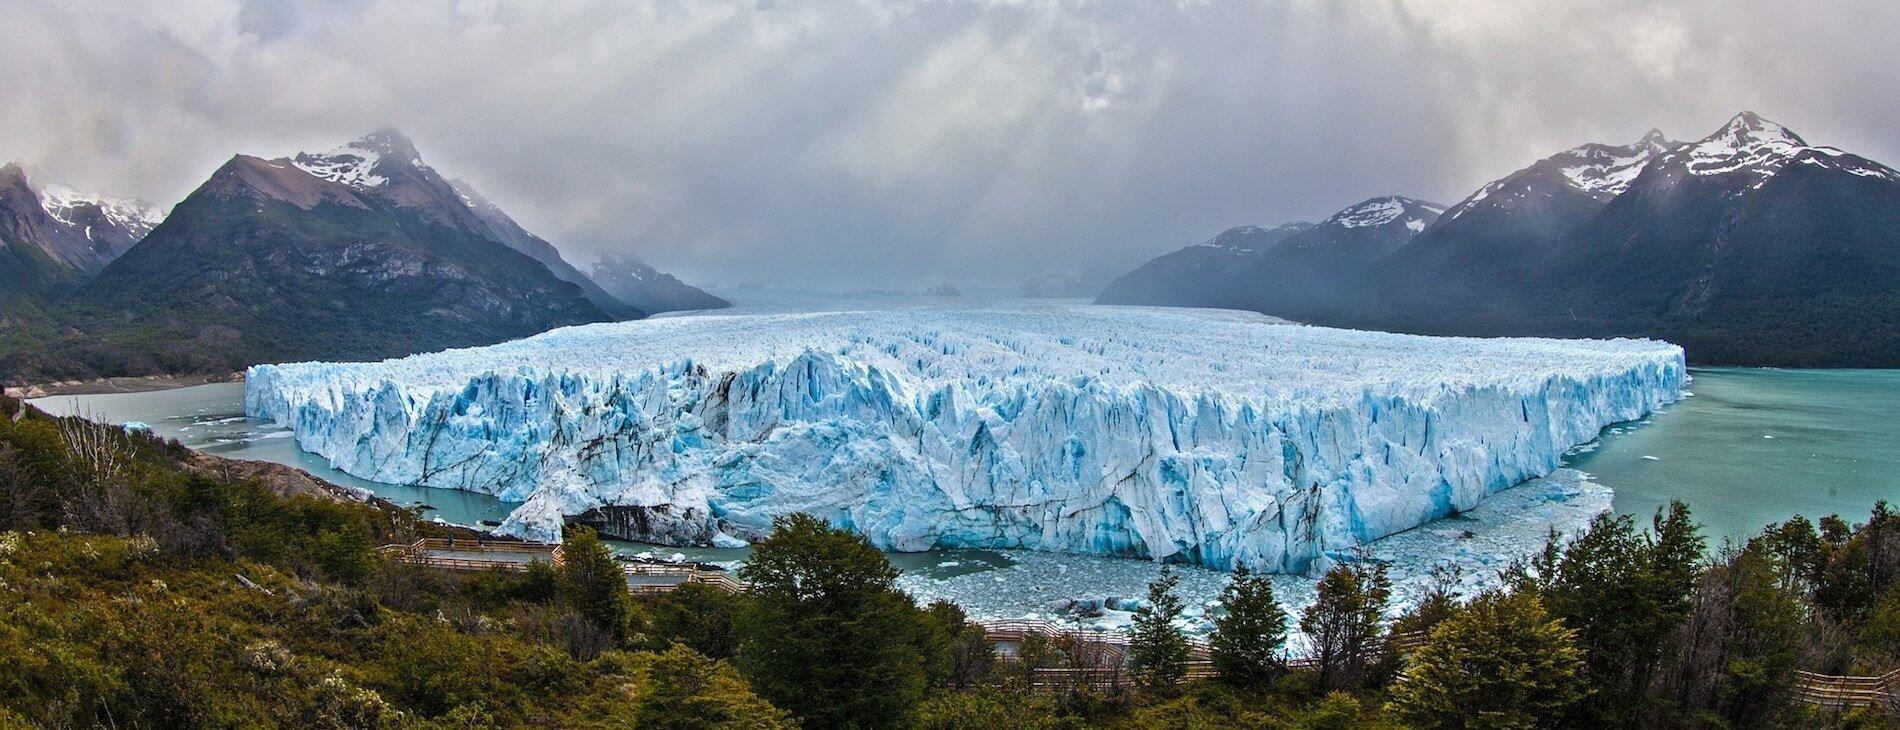 Mastro Patagonico – Slide Home promo PatagMisura